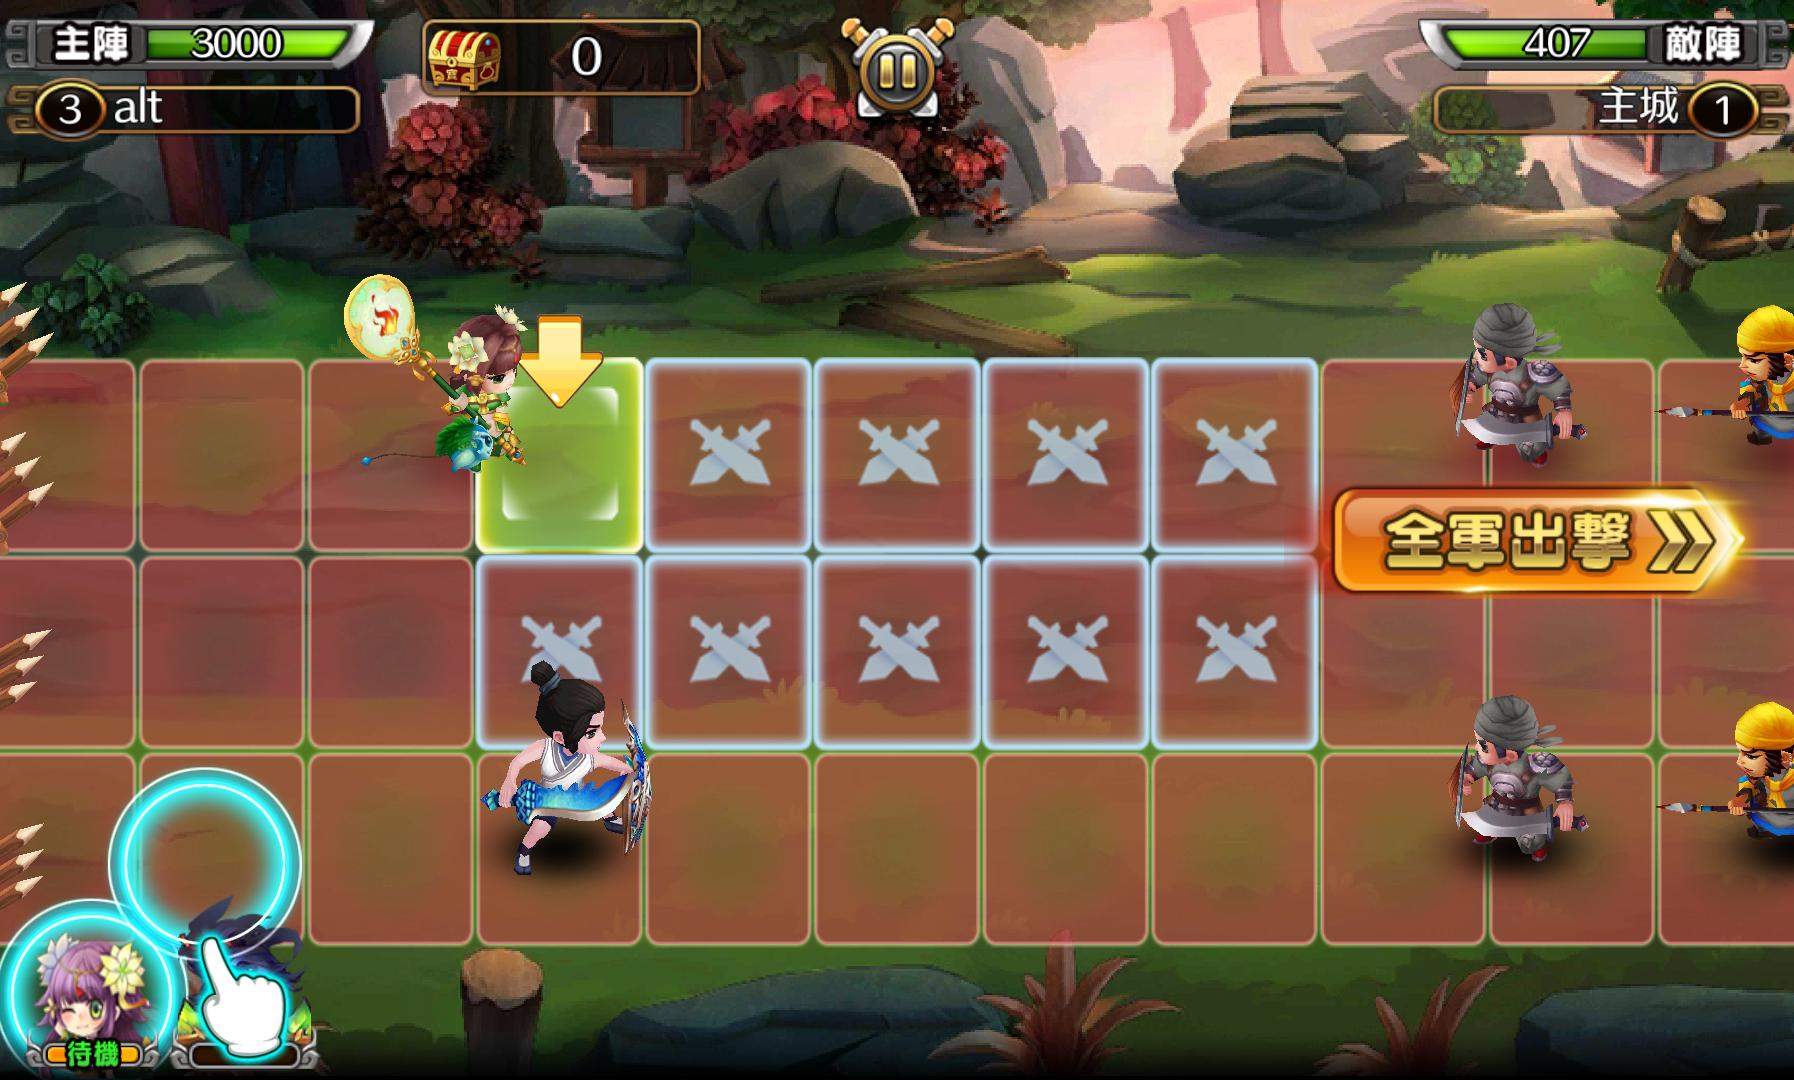 androidアプリ 三国志繚乱バトル攻略スクリーンショット2